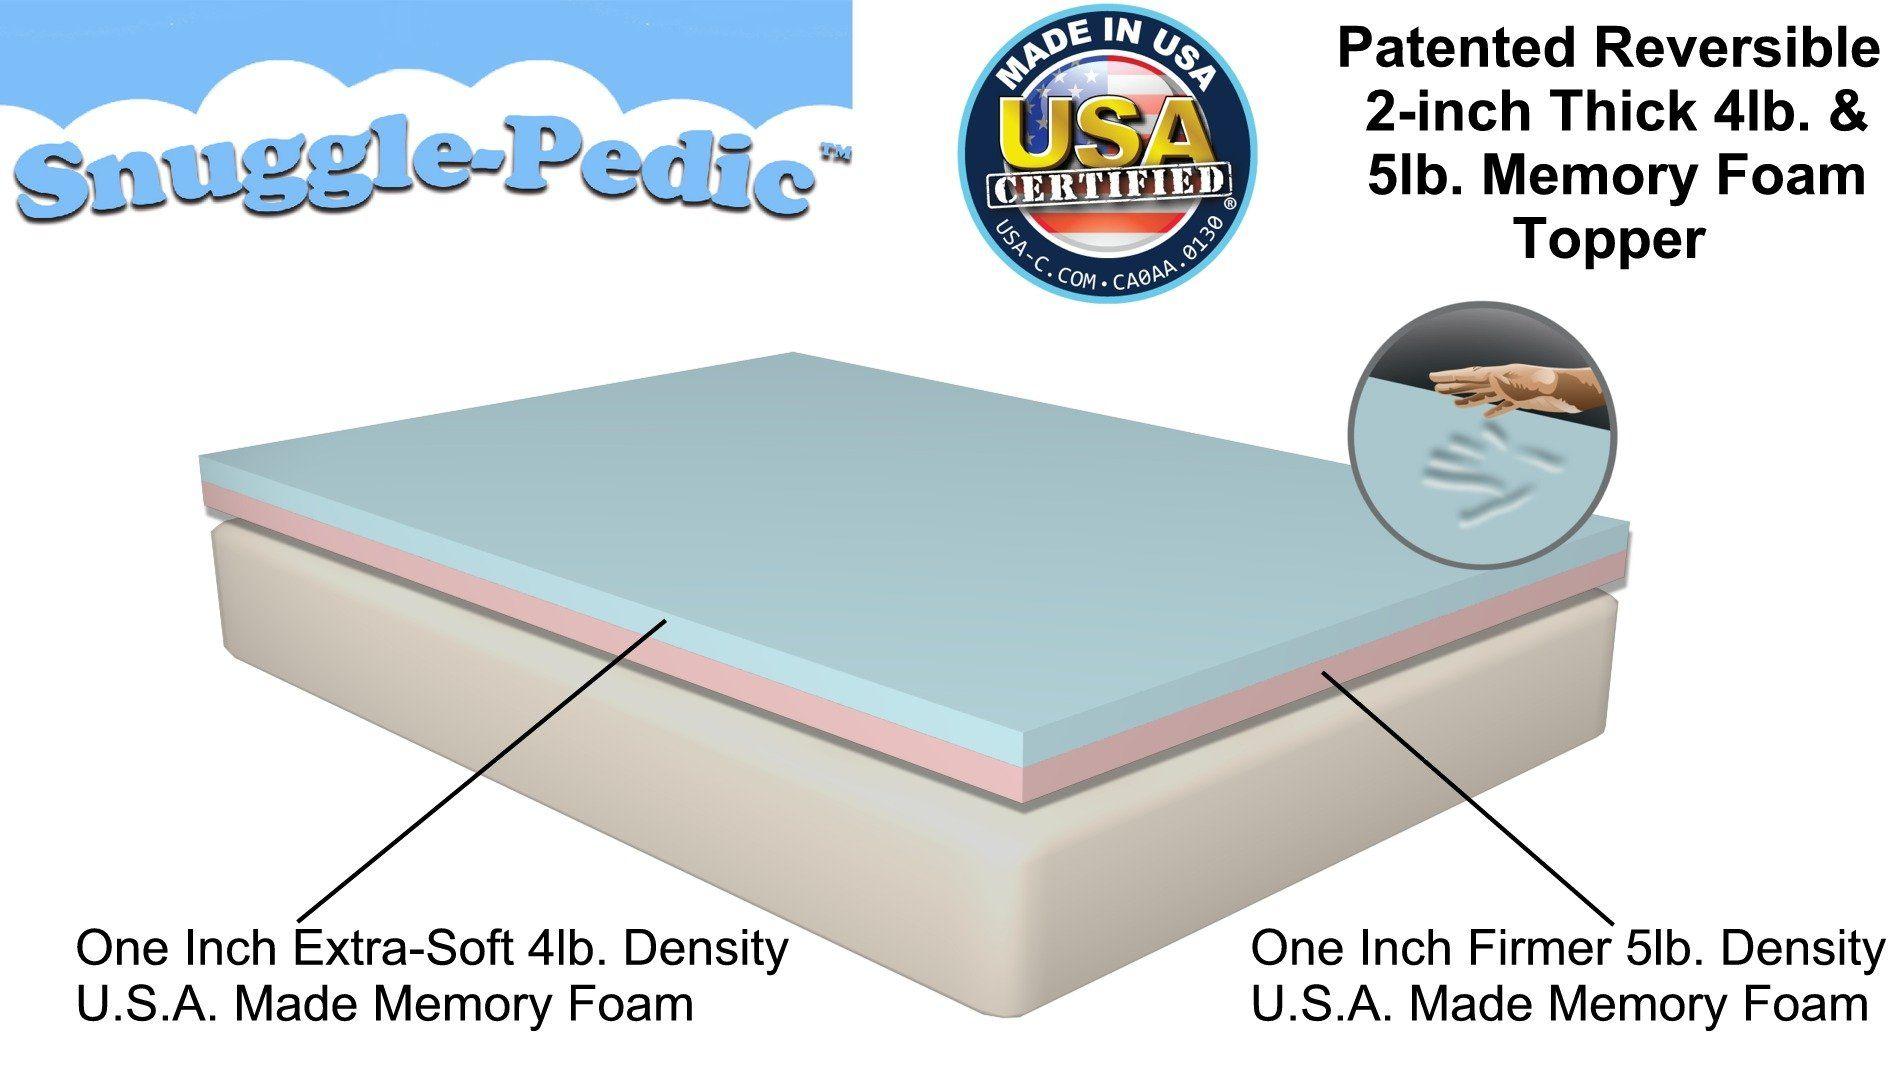 Amazon Com Queen Size Snuggle Pedic Patented Double Layer 4lb 5lb Density Viscoelastic Foam Mattress Topper Foam Mattress Pad Memory Foam Mattress Topper